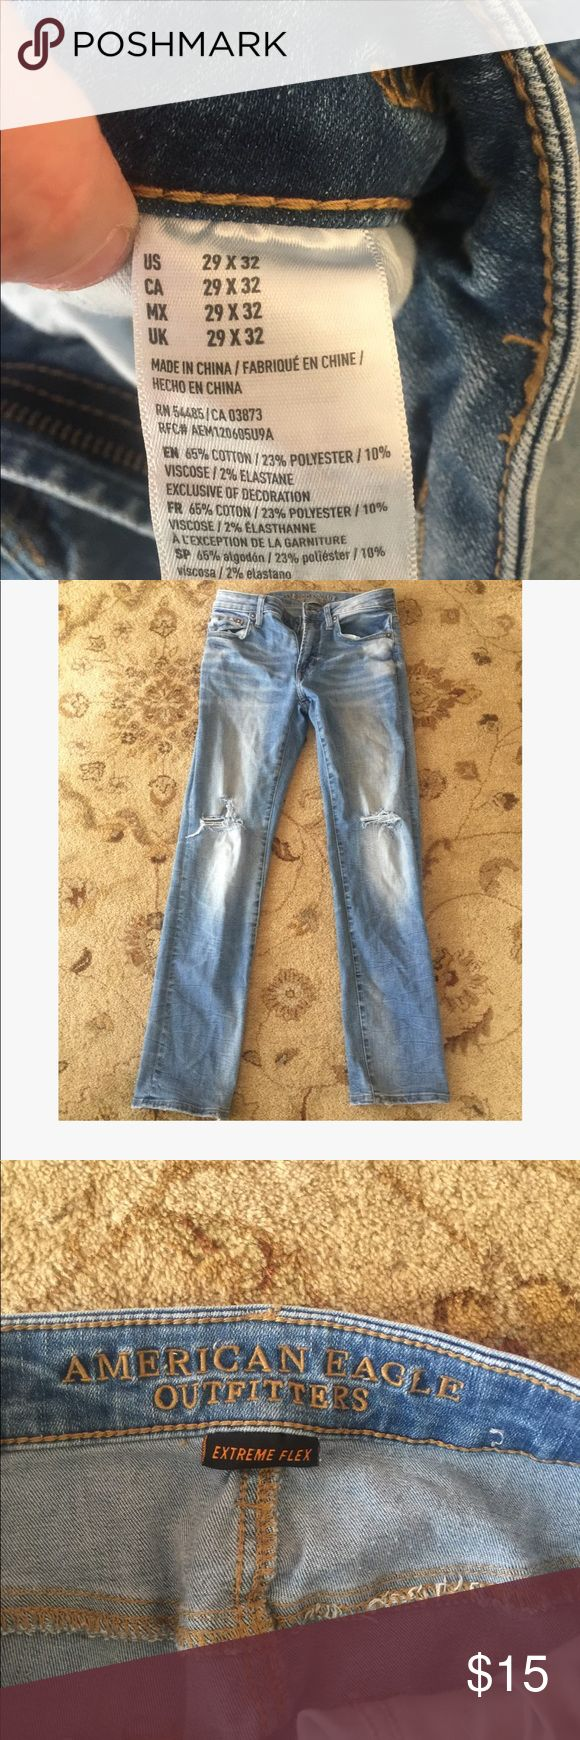 American Eagle men's jeans Extreme flex jeans, worn only a few times Pants Straight Leg